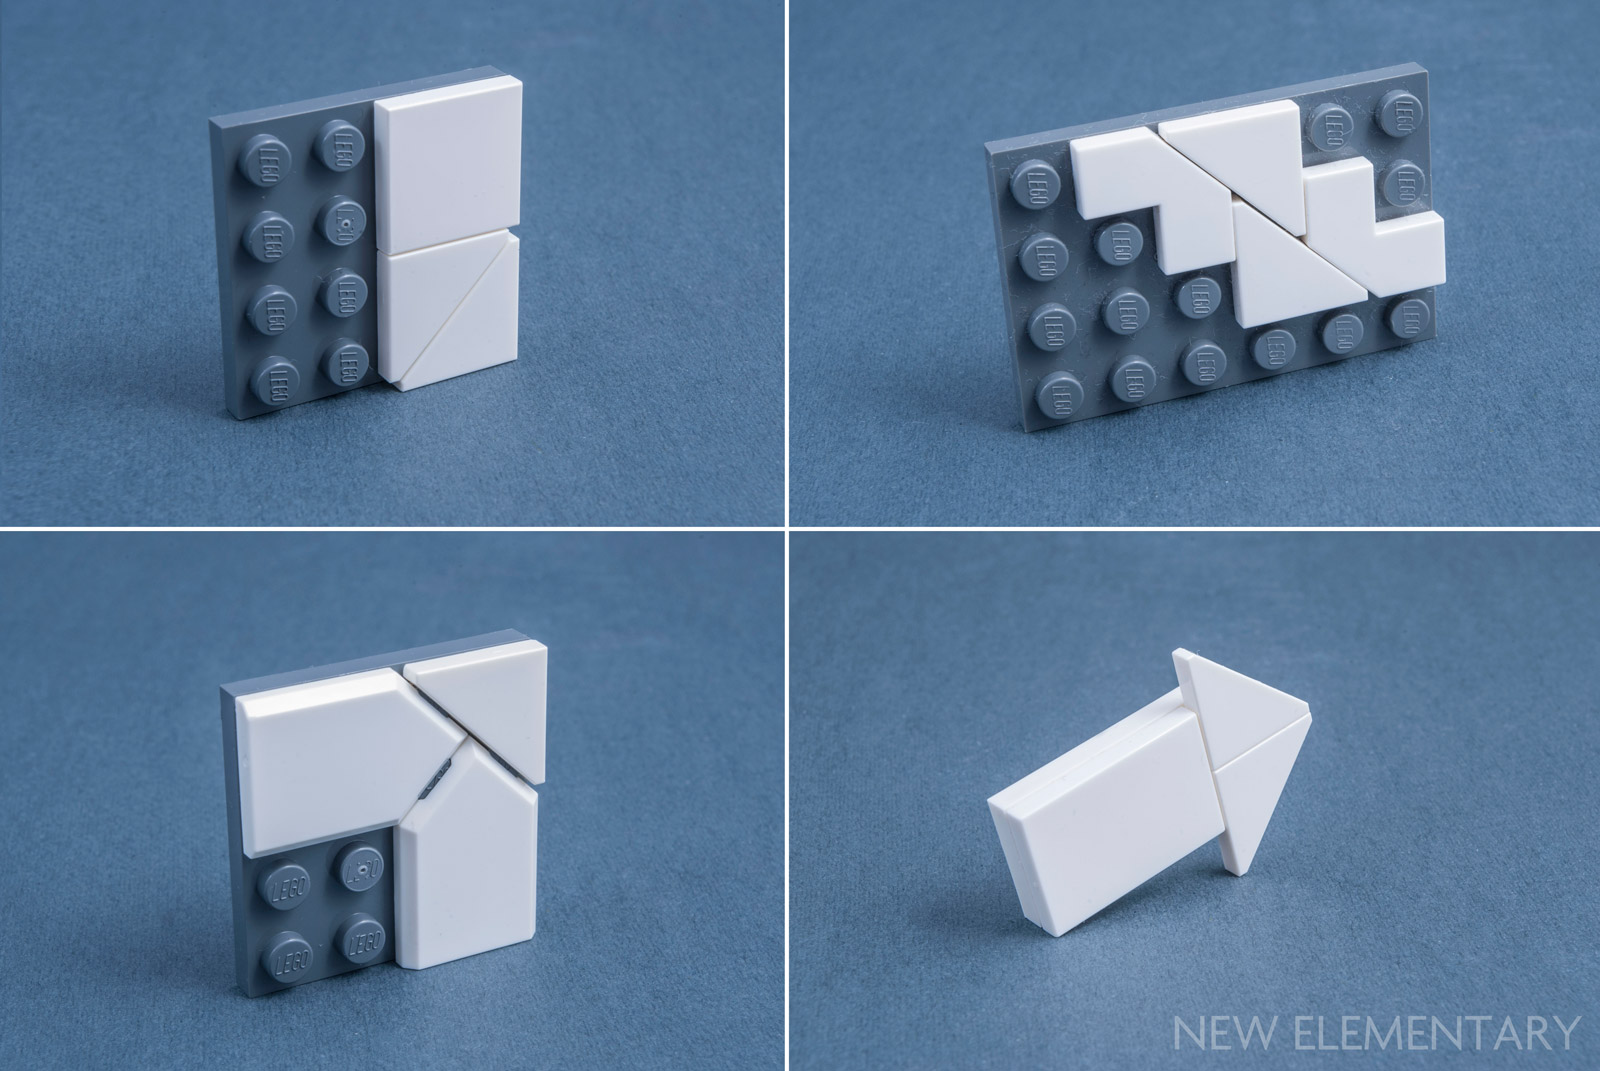 Lego Lot of 50 New Light Bluish Gray Tiles 2 x 2 Corner Flat Smooth Pieces